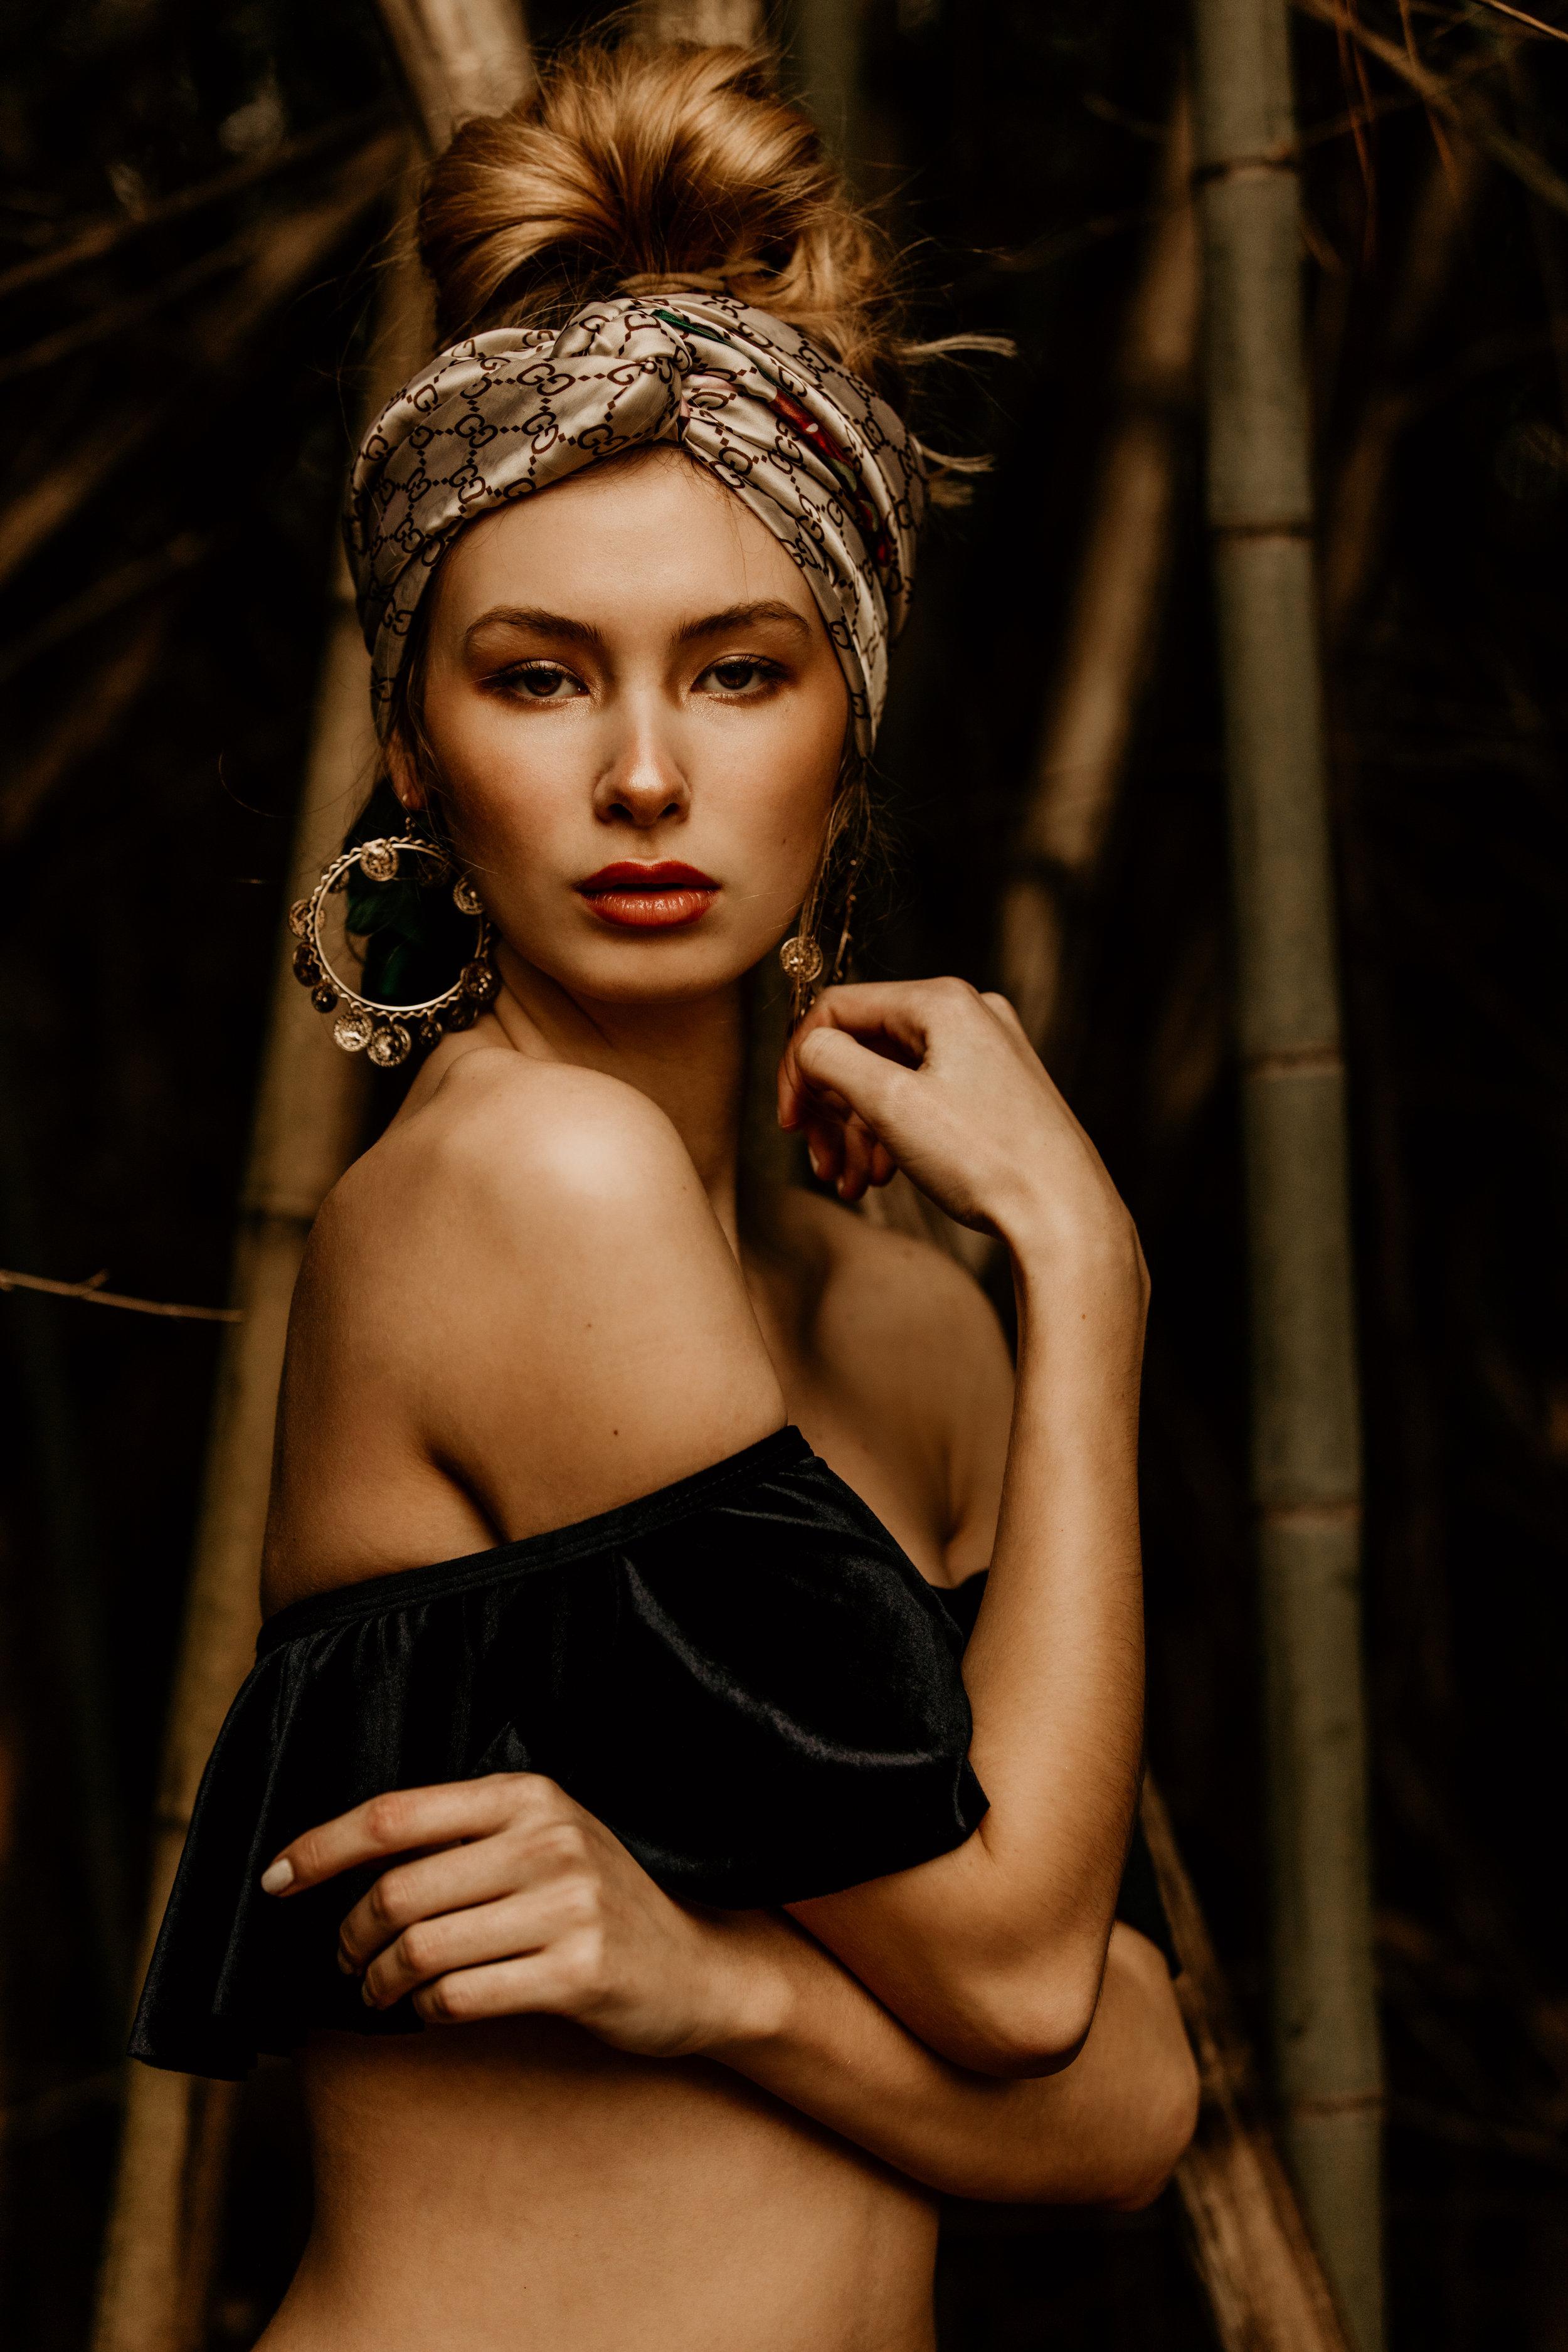 PHOTOGRAPHy-fashion-bamboo-3594ps.jpg